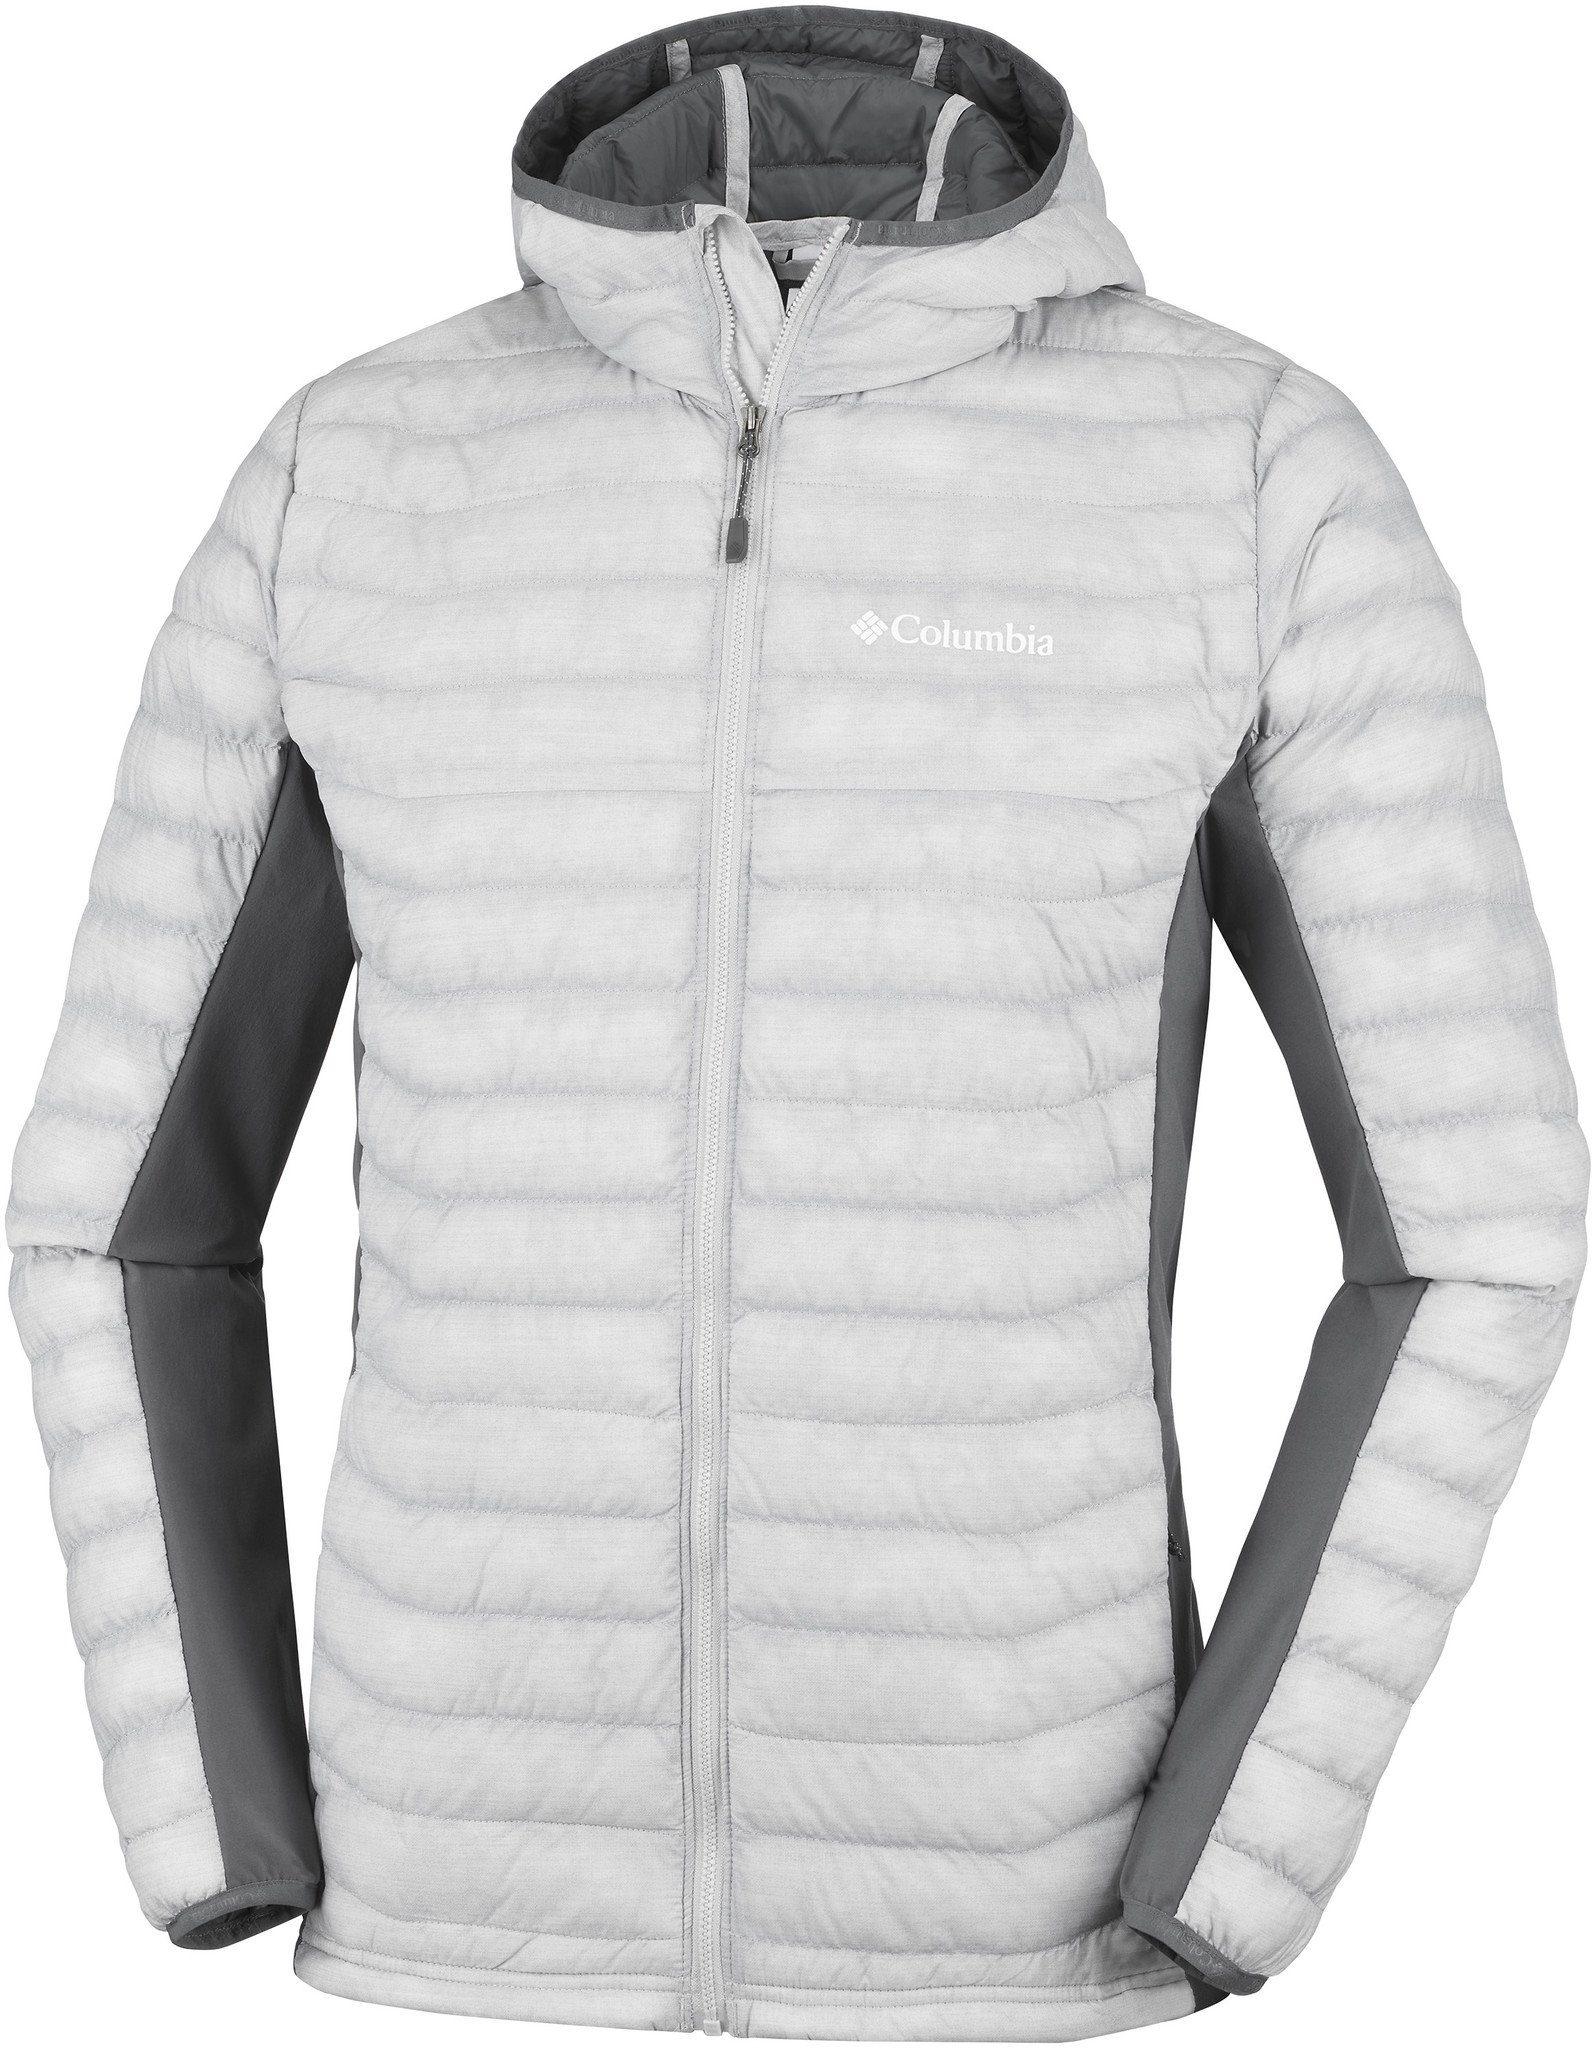 kaufenOTTO »Powder 2019 Columbia online Hooded Outdoorjacke Light Herren«Modelljahr Lite Jacket v0NmnOy8w